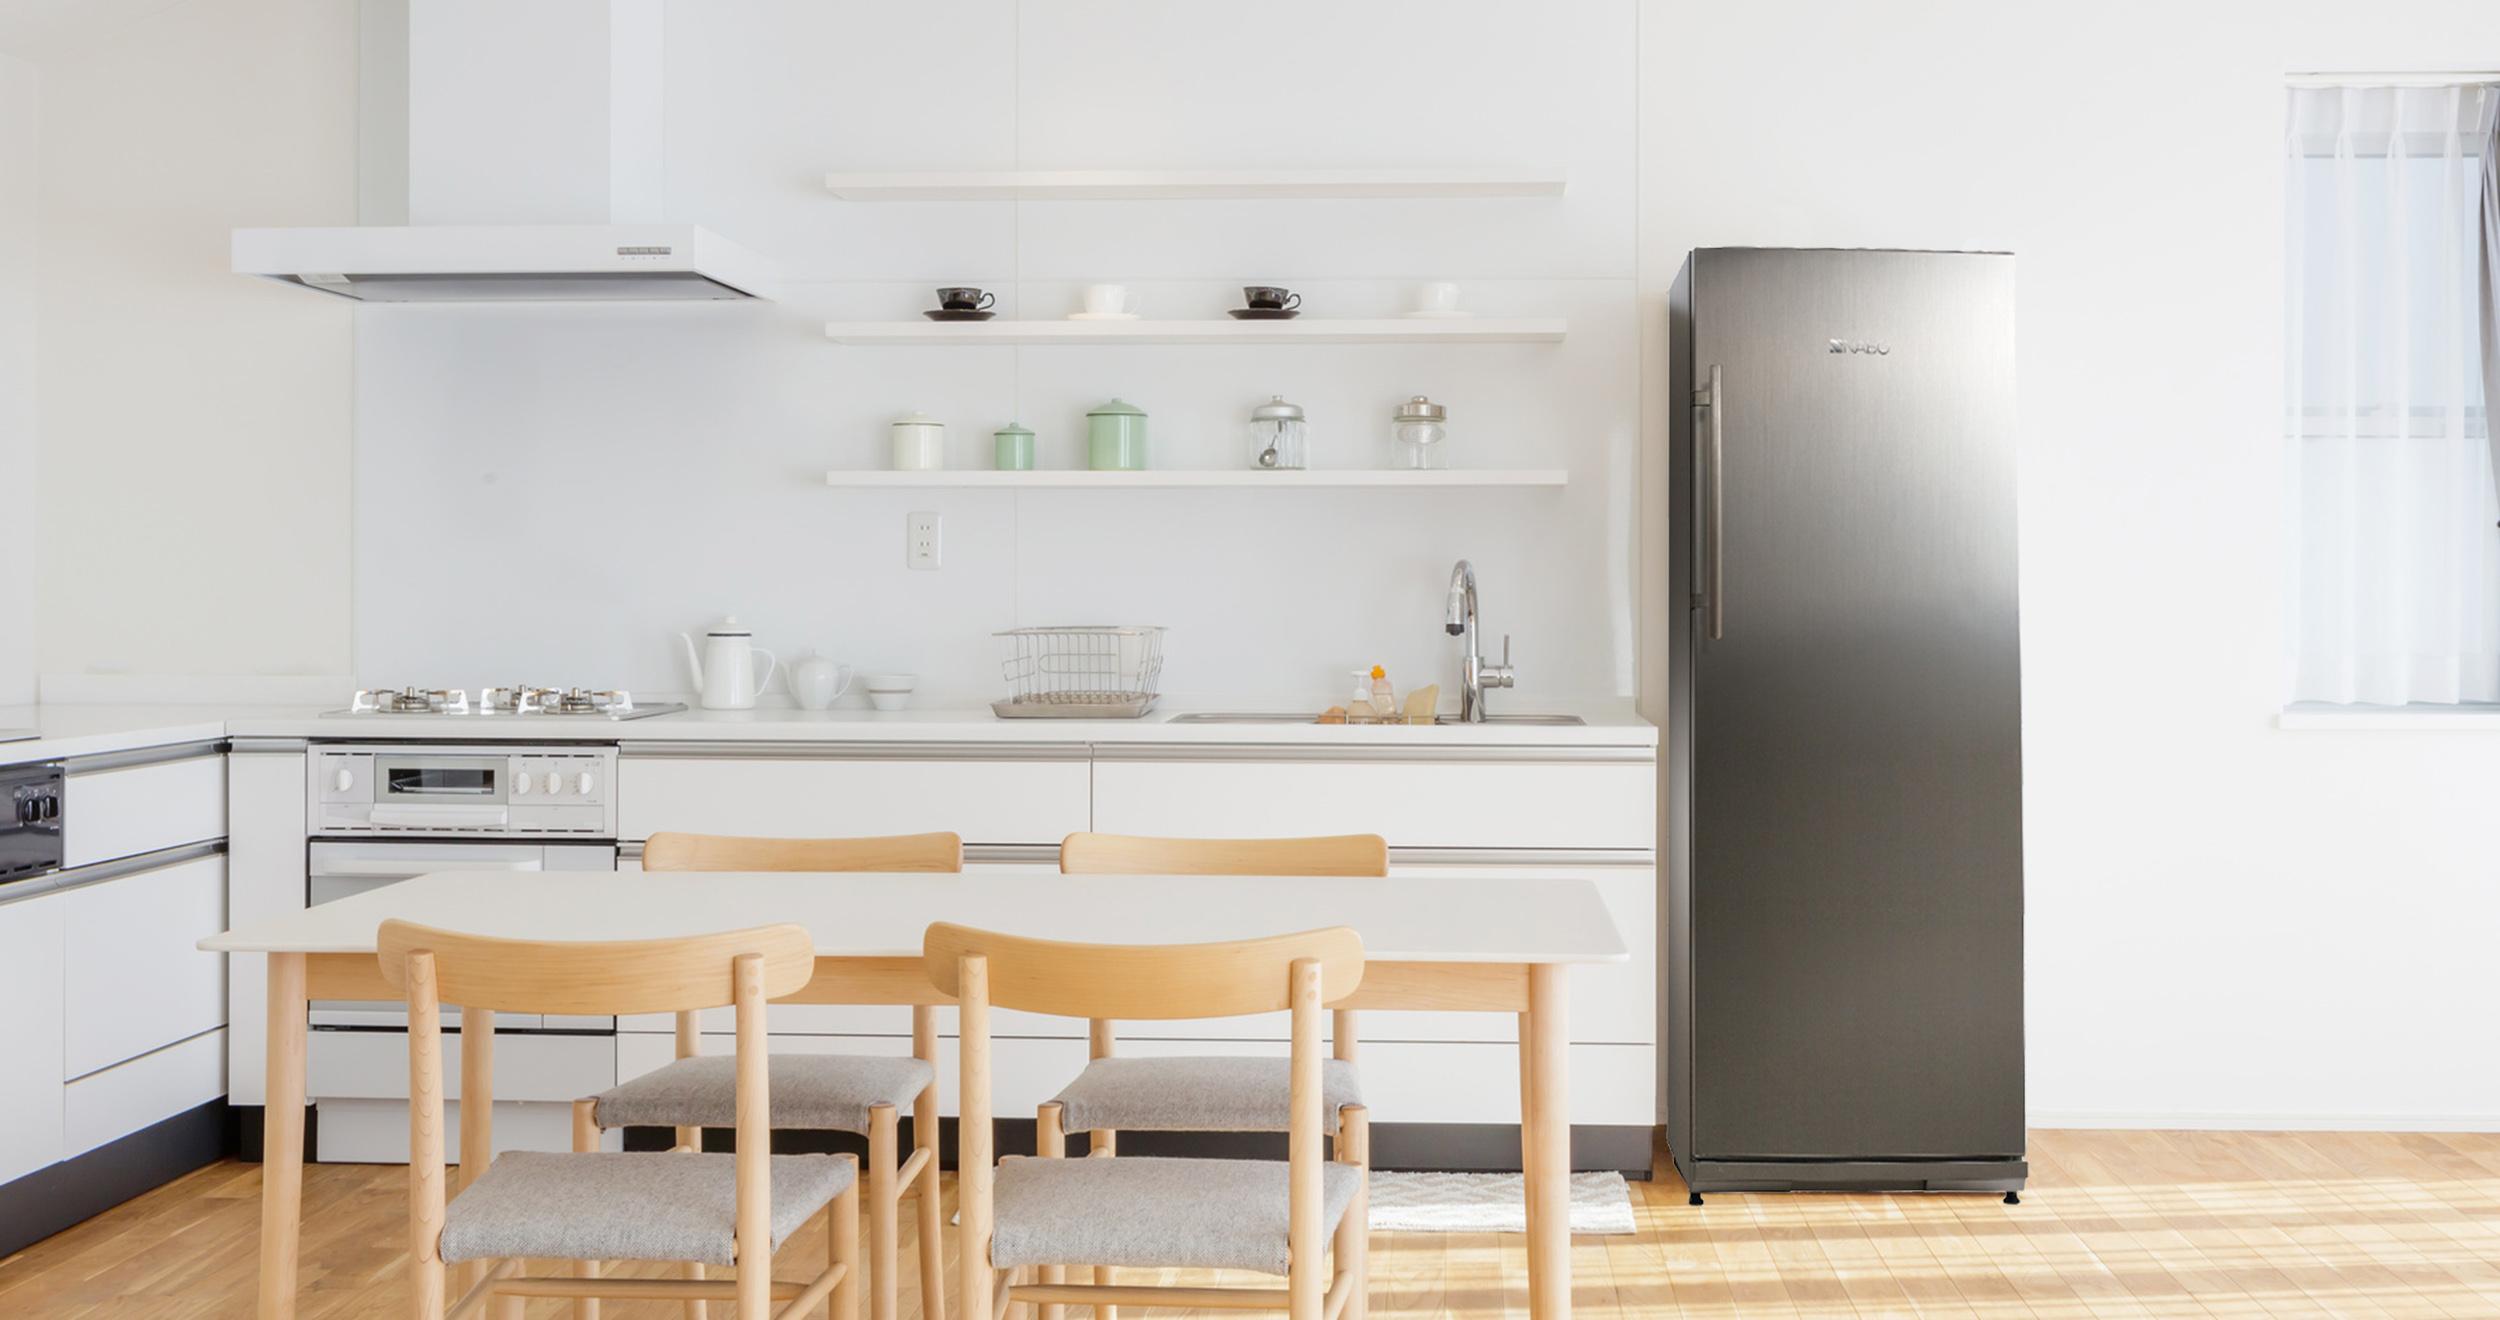 Mini Kühlschrank Nostalgie : Erste retro kühlschrank a aeenebahai